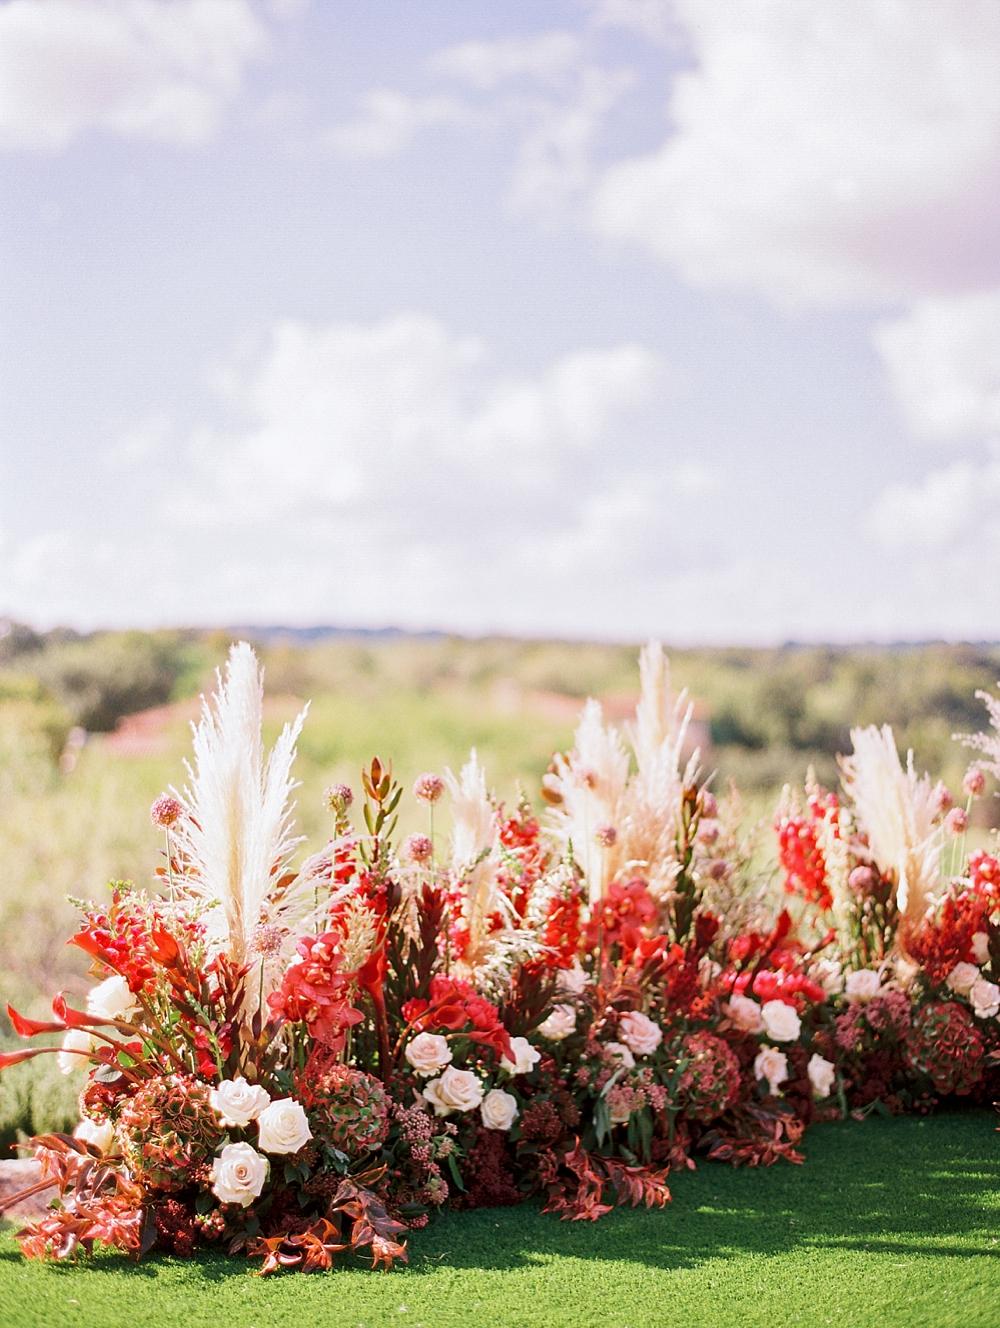 kristin-la-voie-photography-AUSTIN-WEDDING-PHOTOGRAPHER-BEST-IN-TEXAS-92